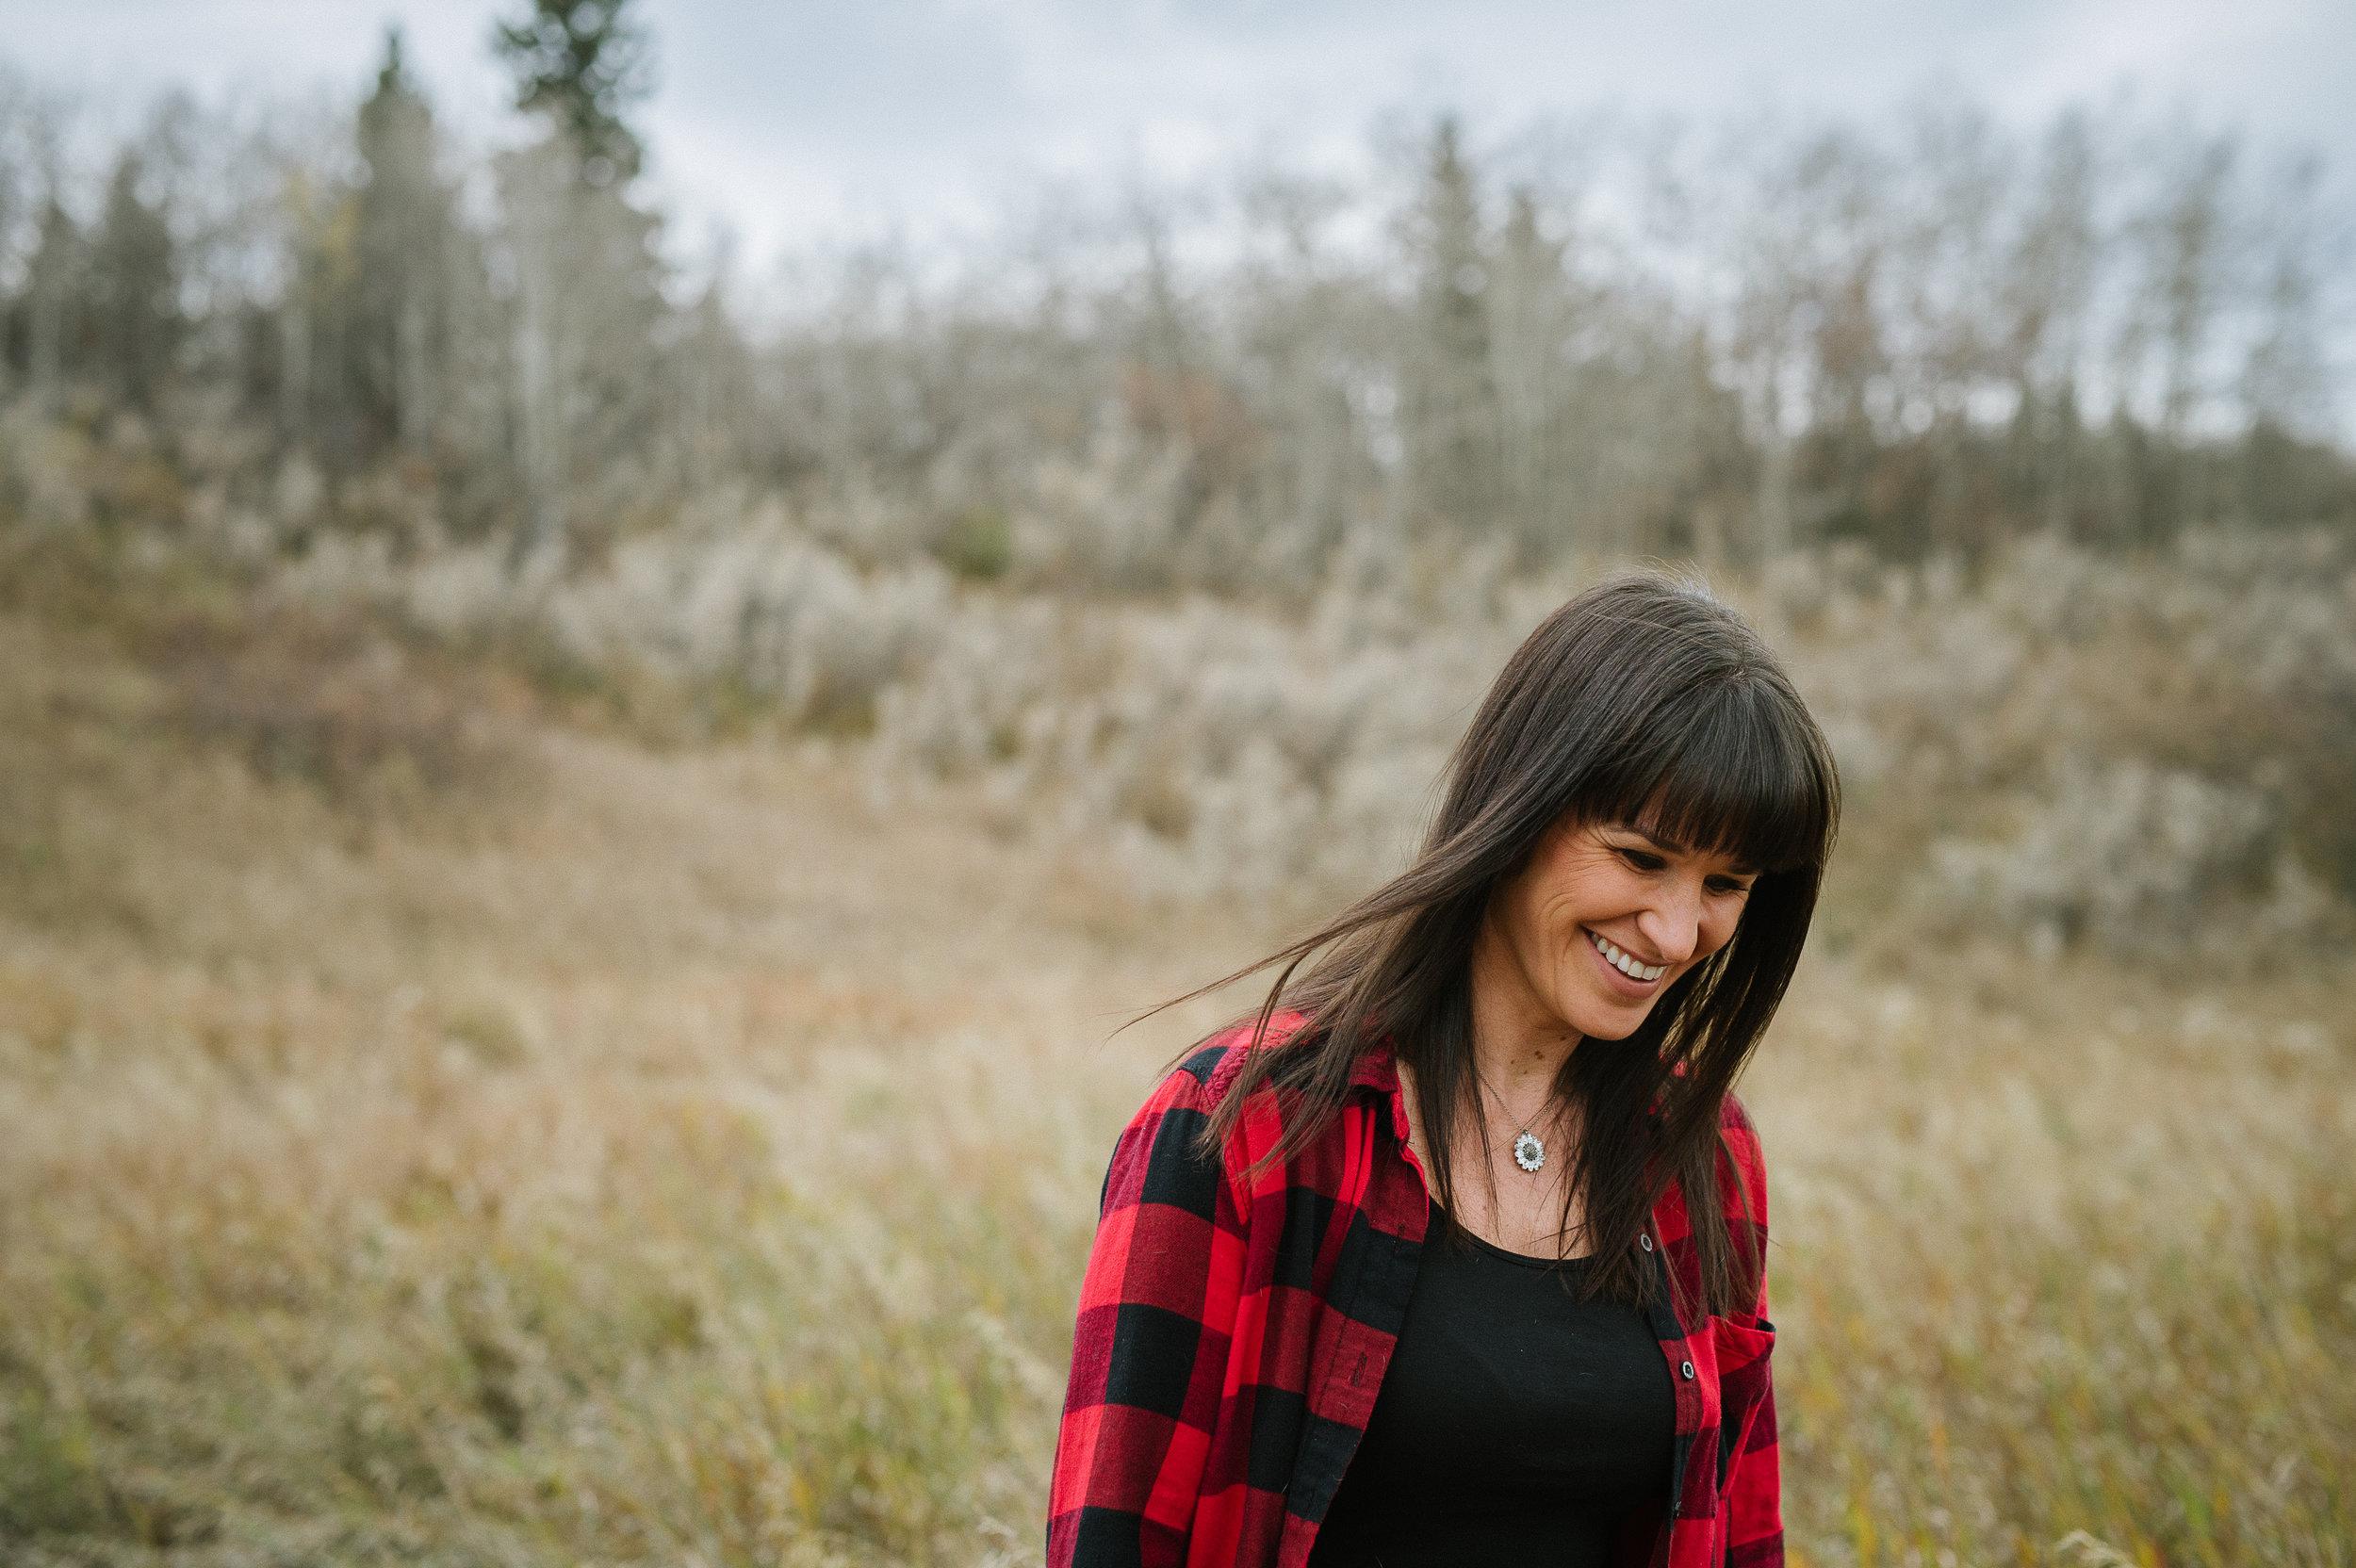 Calgary_Family_Photography_Peters_2017_HR 0019.jpg